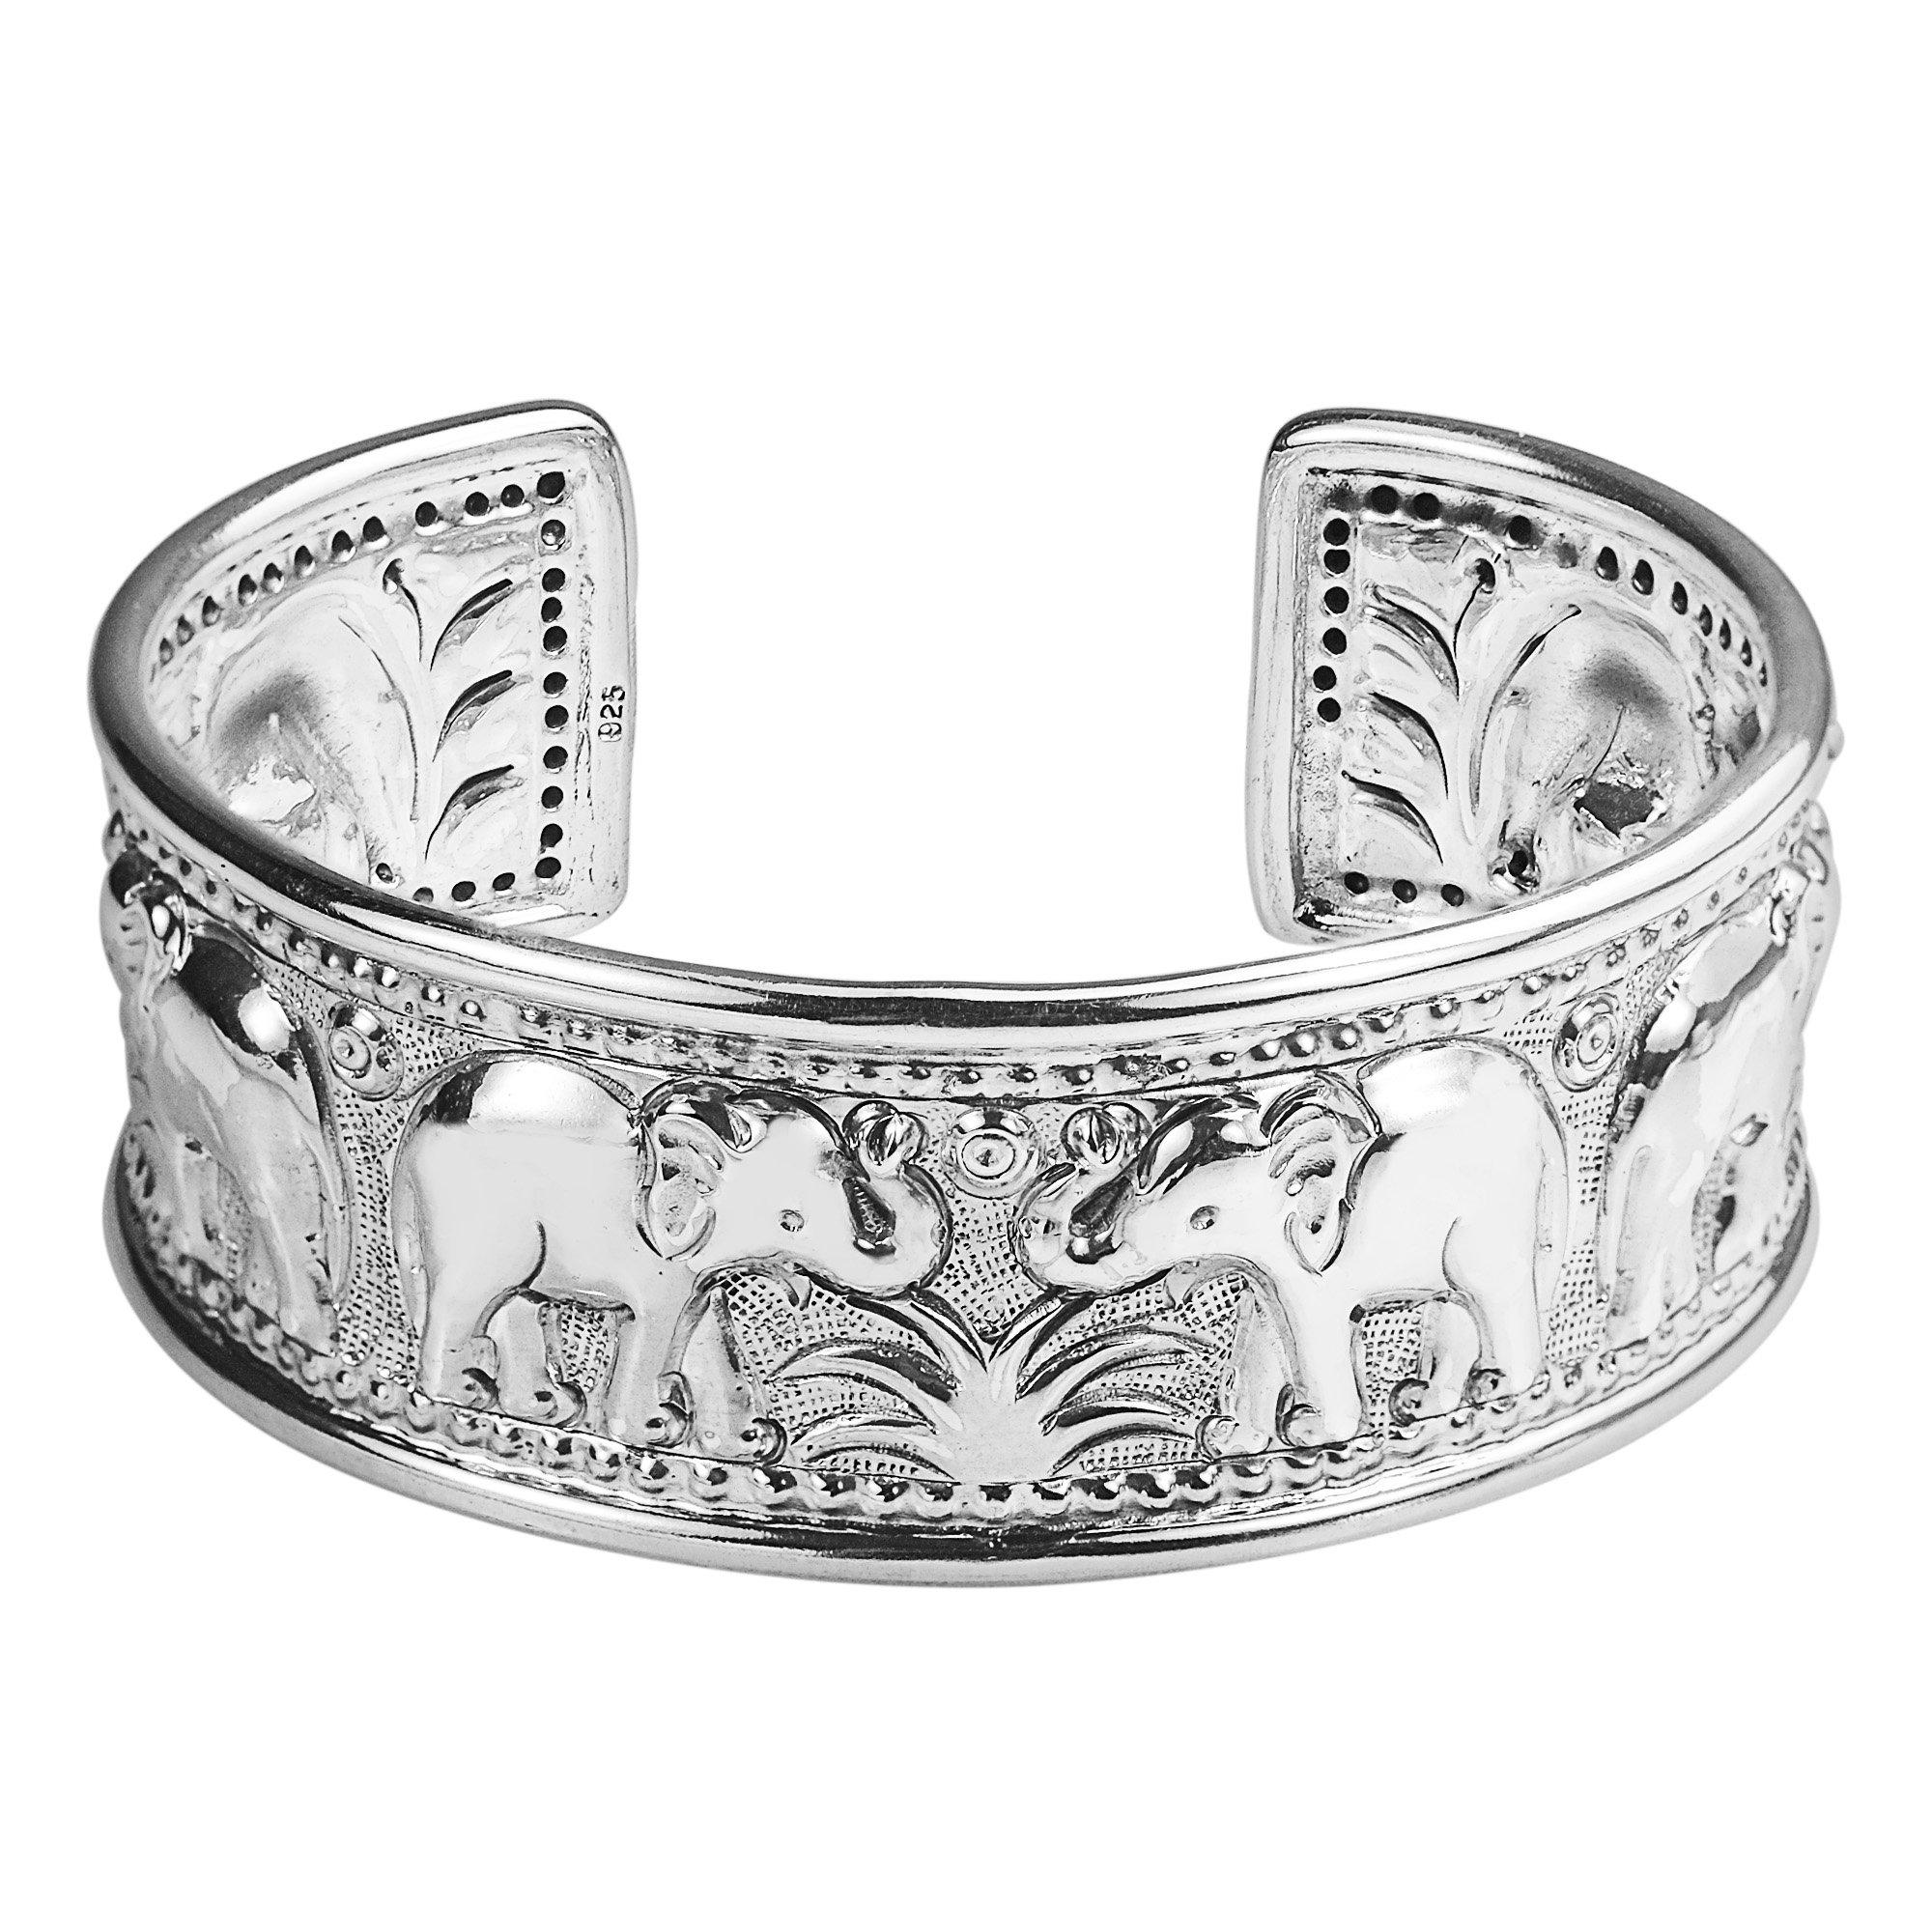 Elephant Jungle Trek Thai Yao Hill Tribe Fine Silver Adjustable Cuff Bracelet by AeraVida (Image #1)